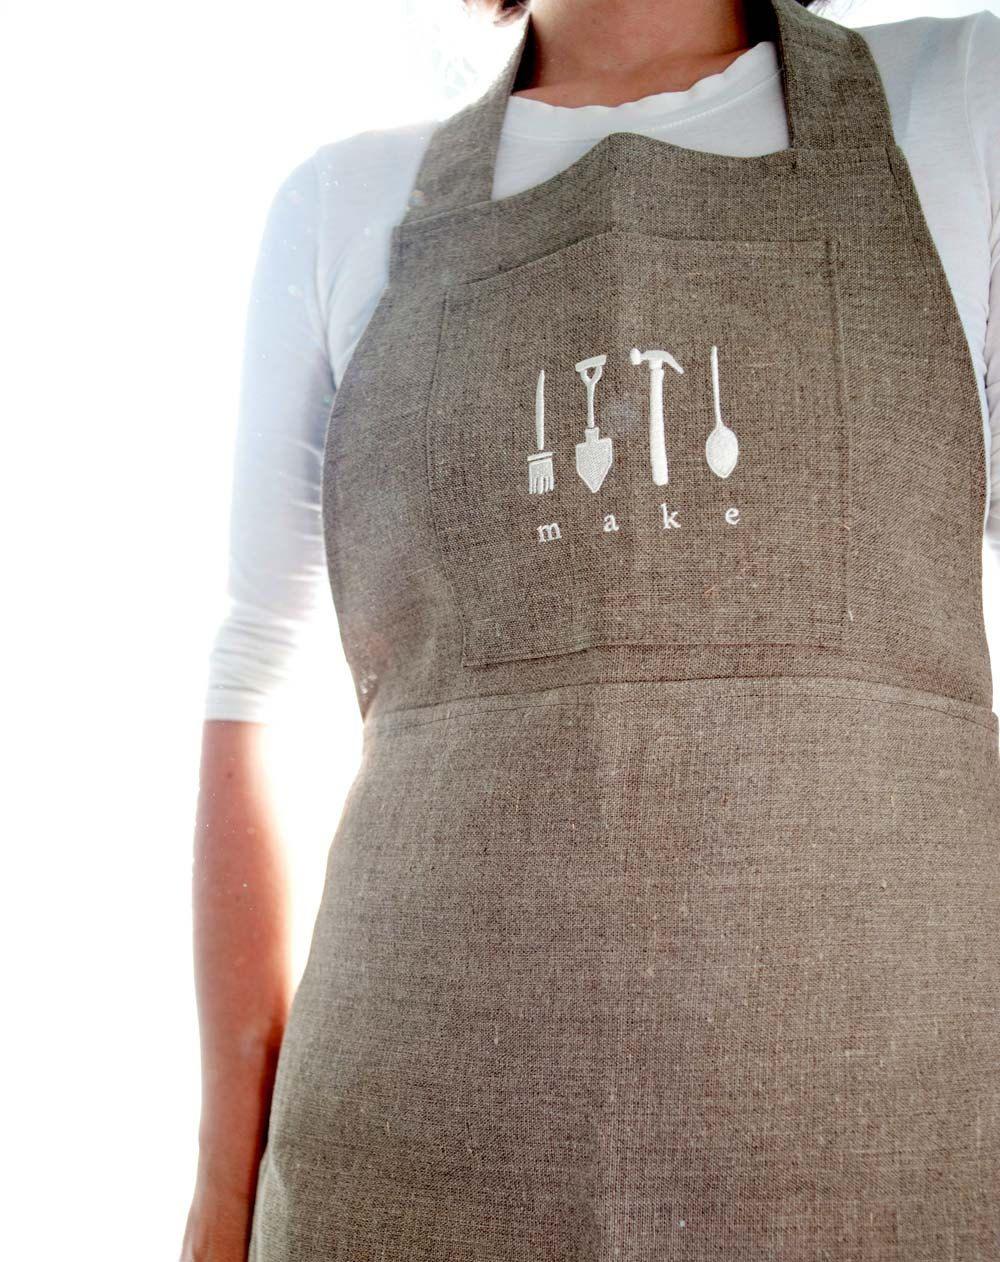 White apron mockup - Aprons